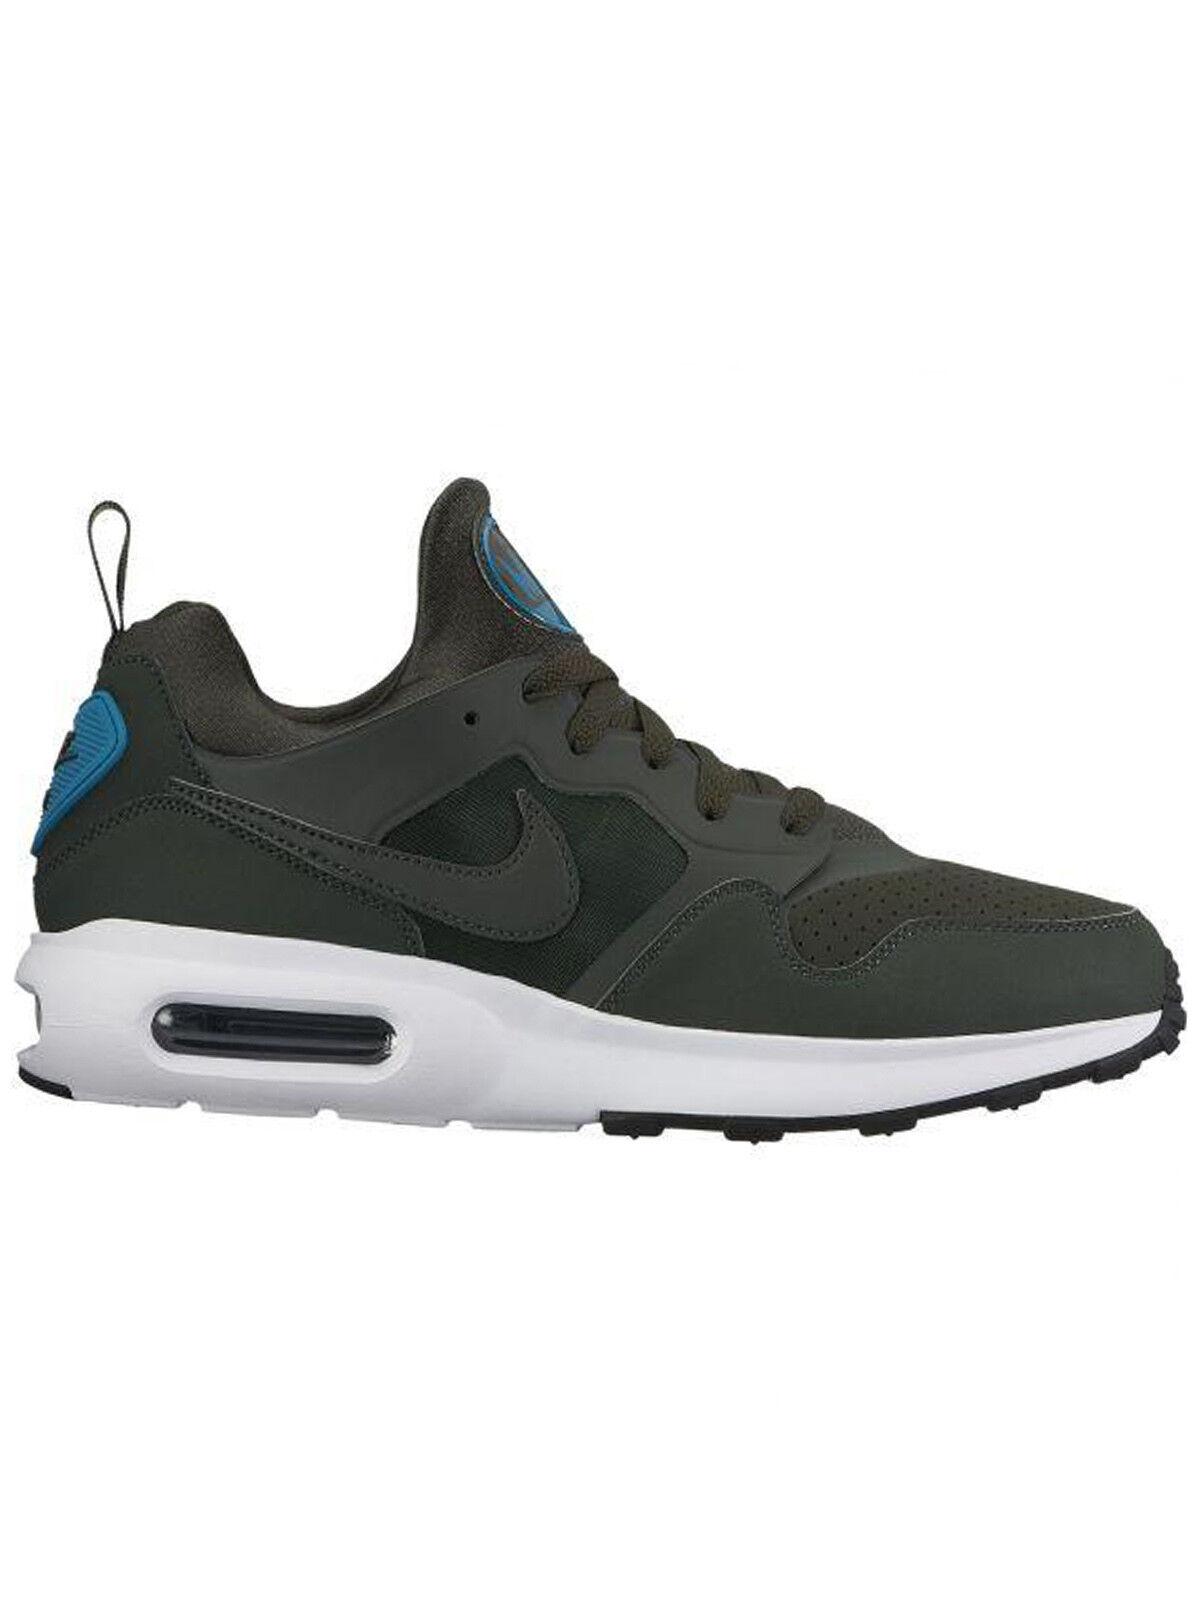 Nike air max primo sl 876069 300